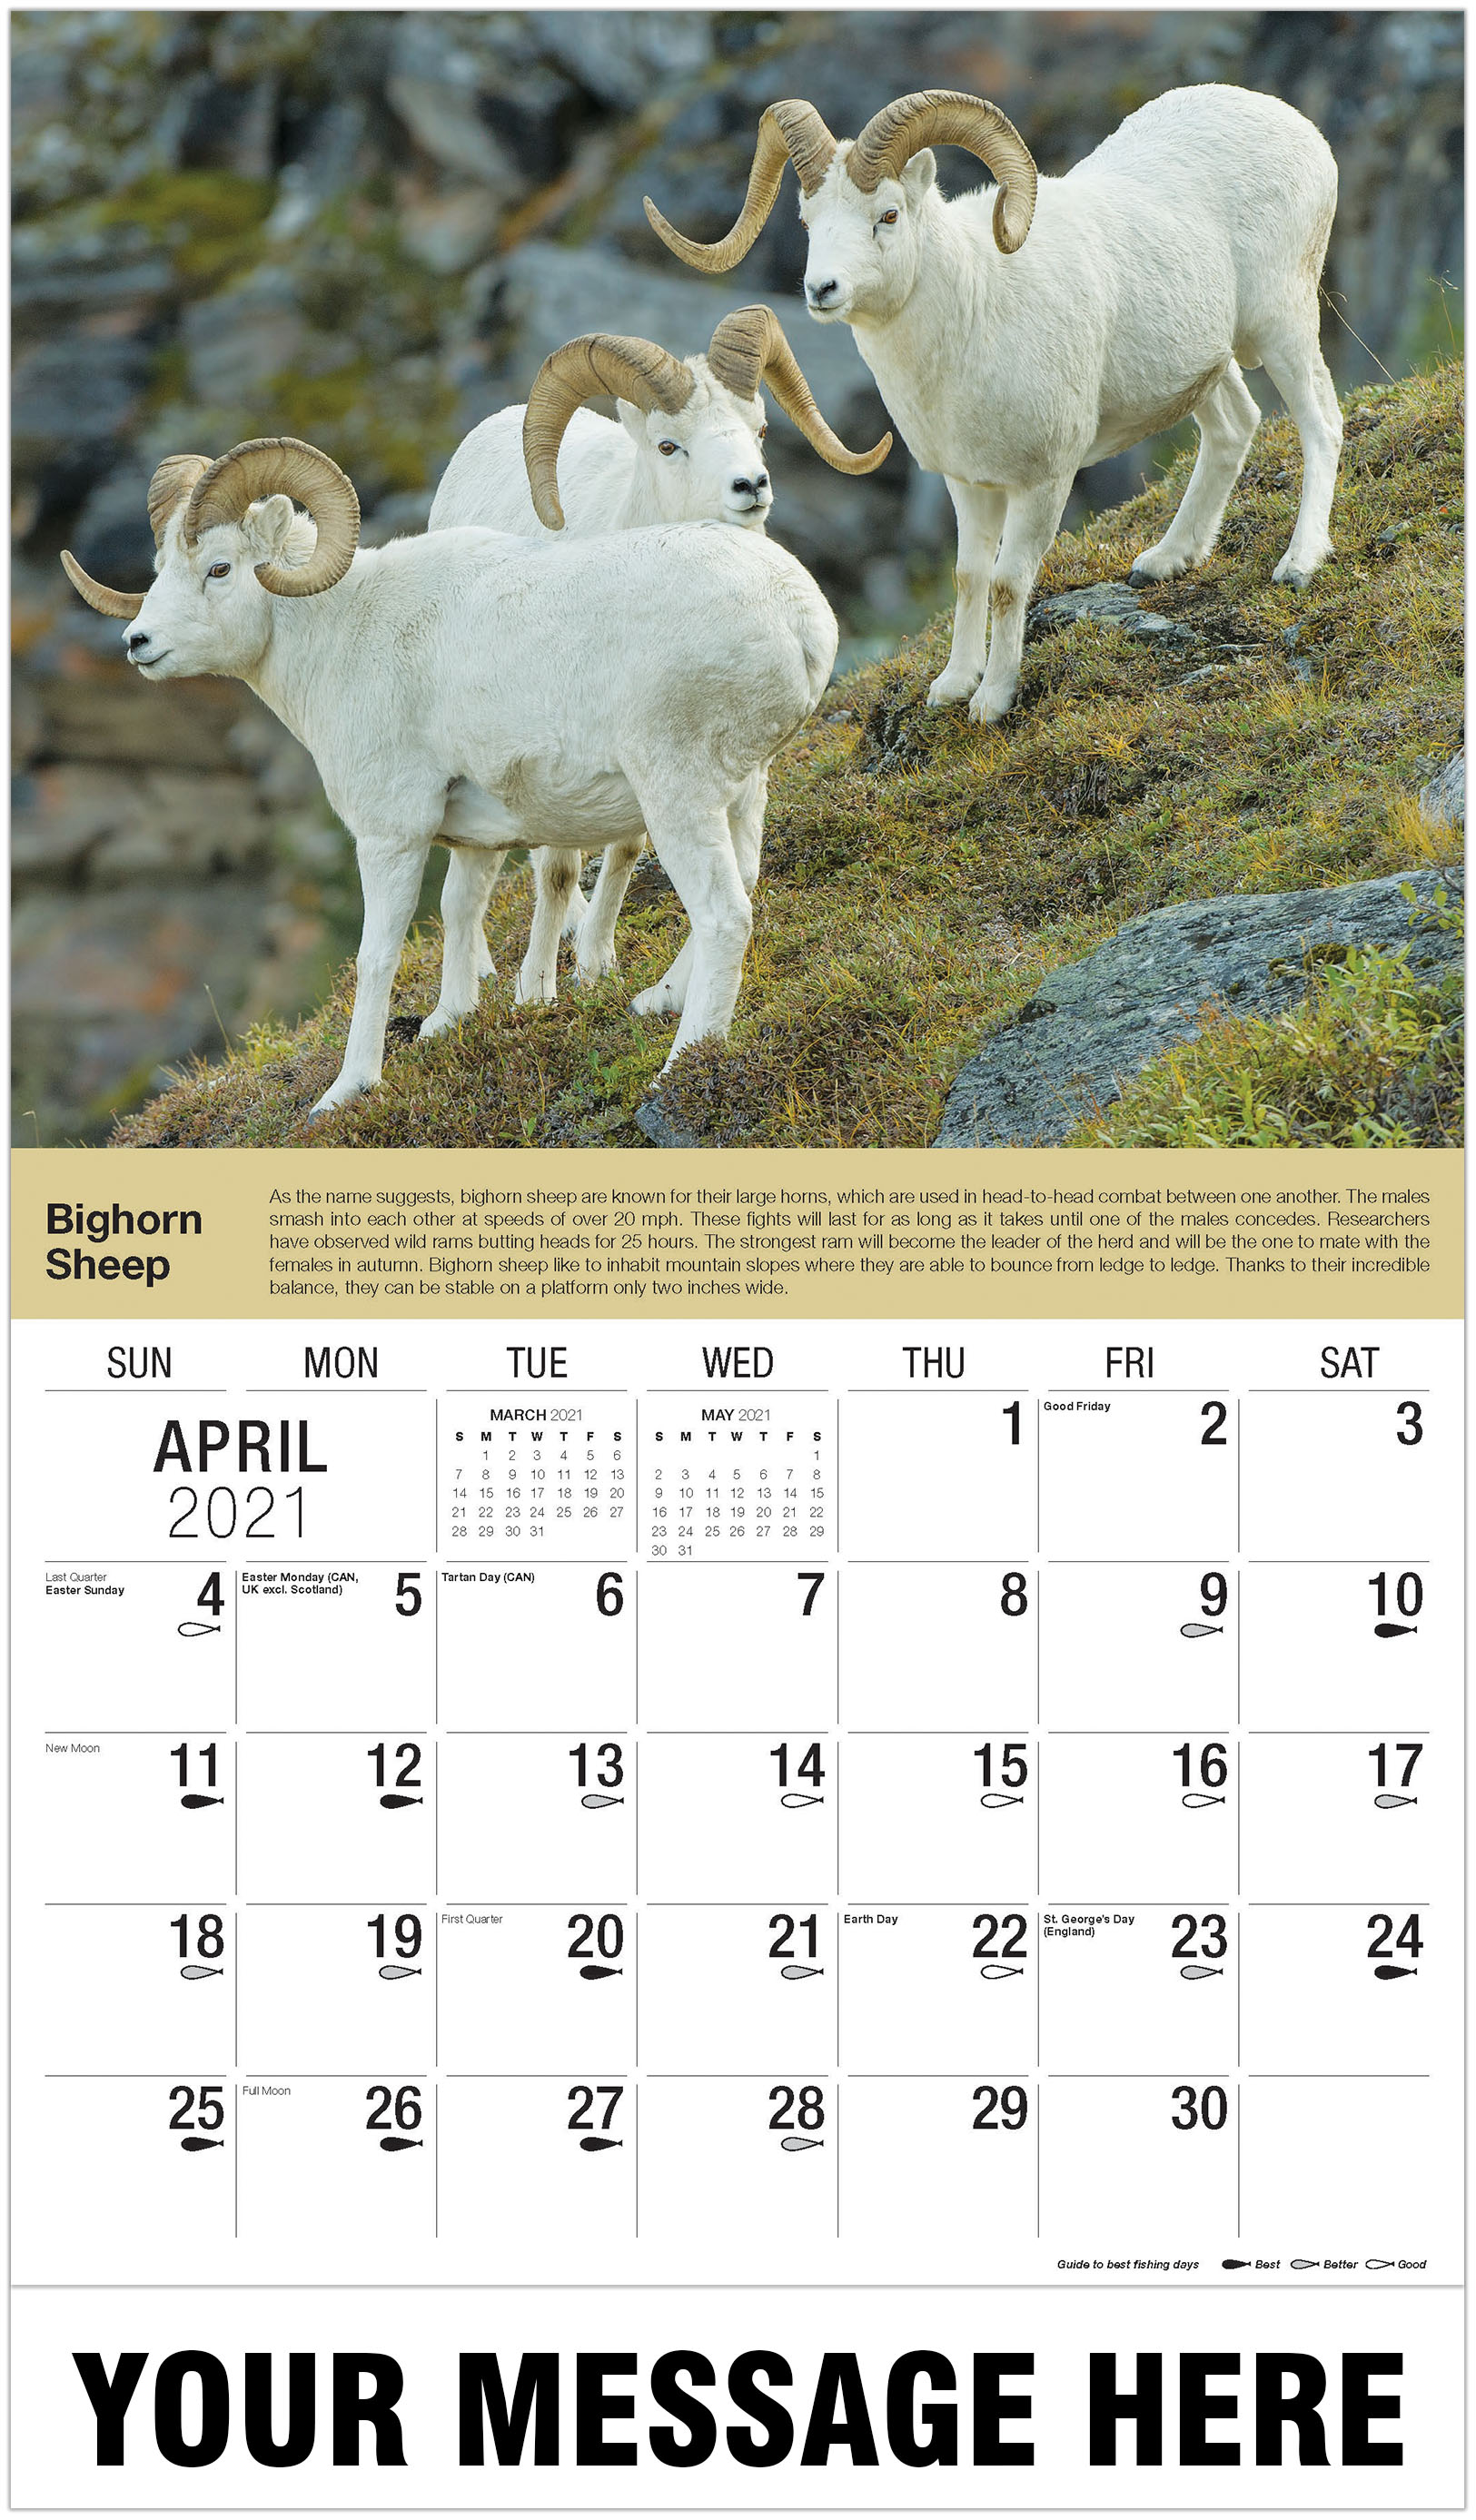 Dall Sheep Rams - April - North American Wildlife 2021 Promotional Calendar